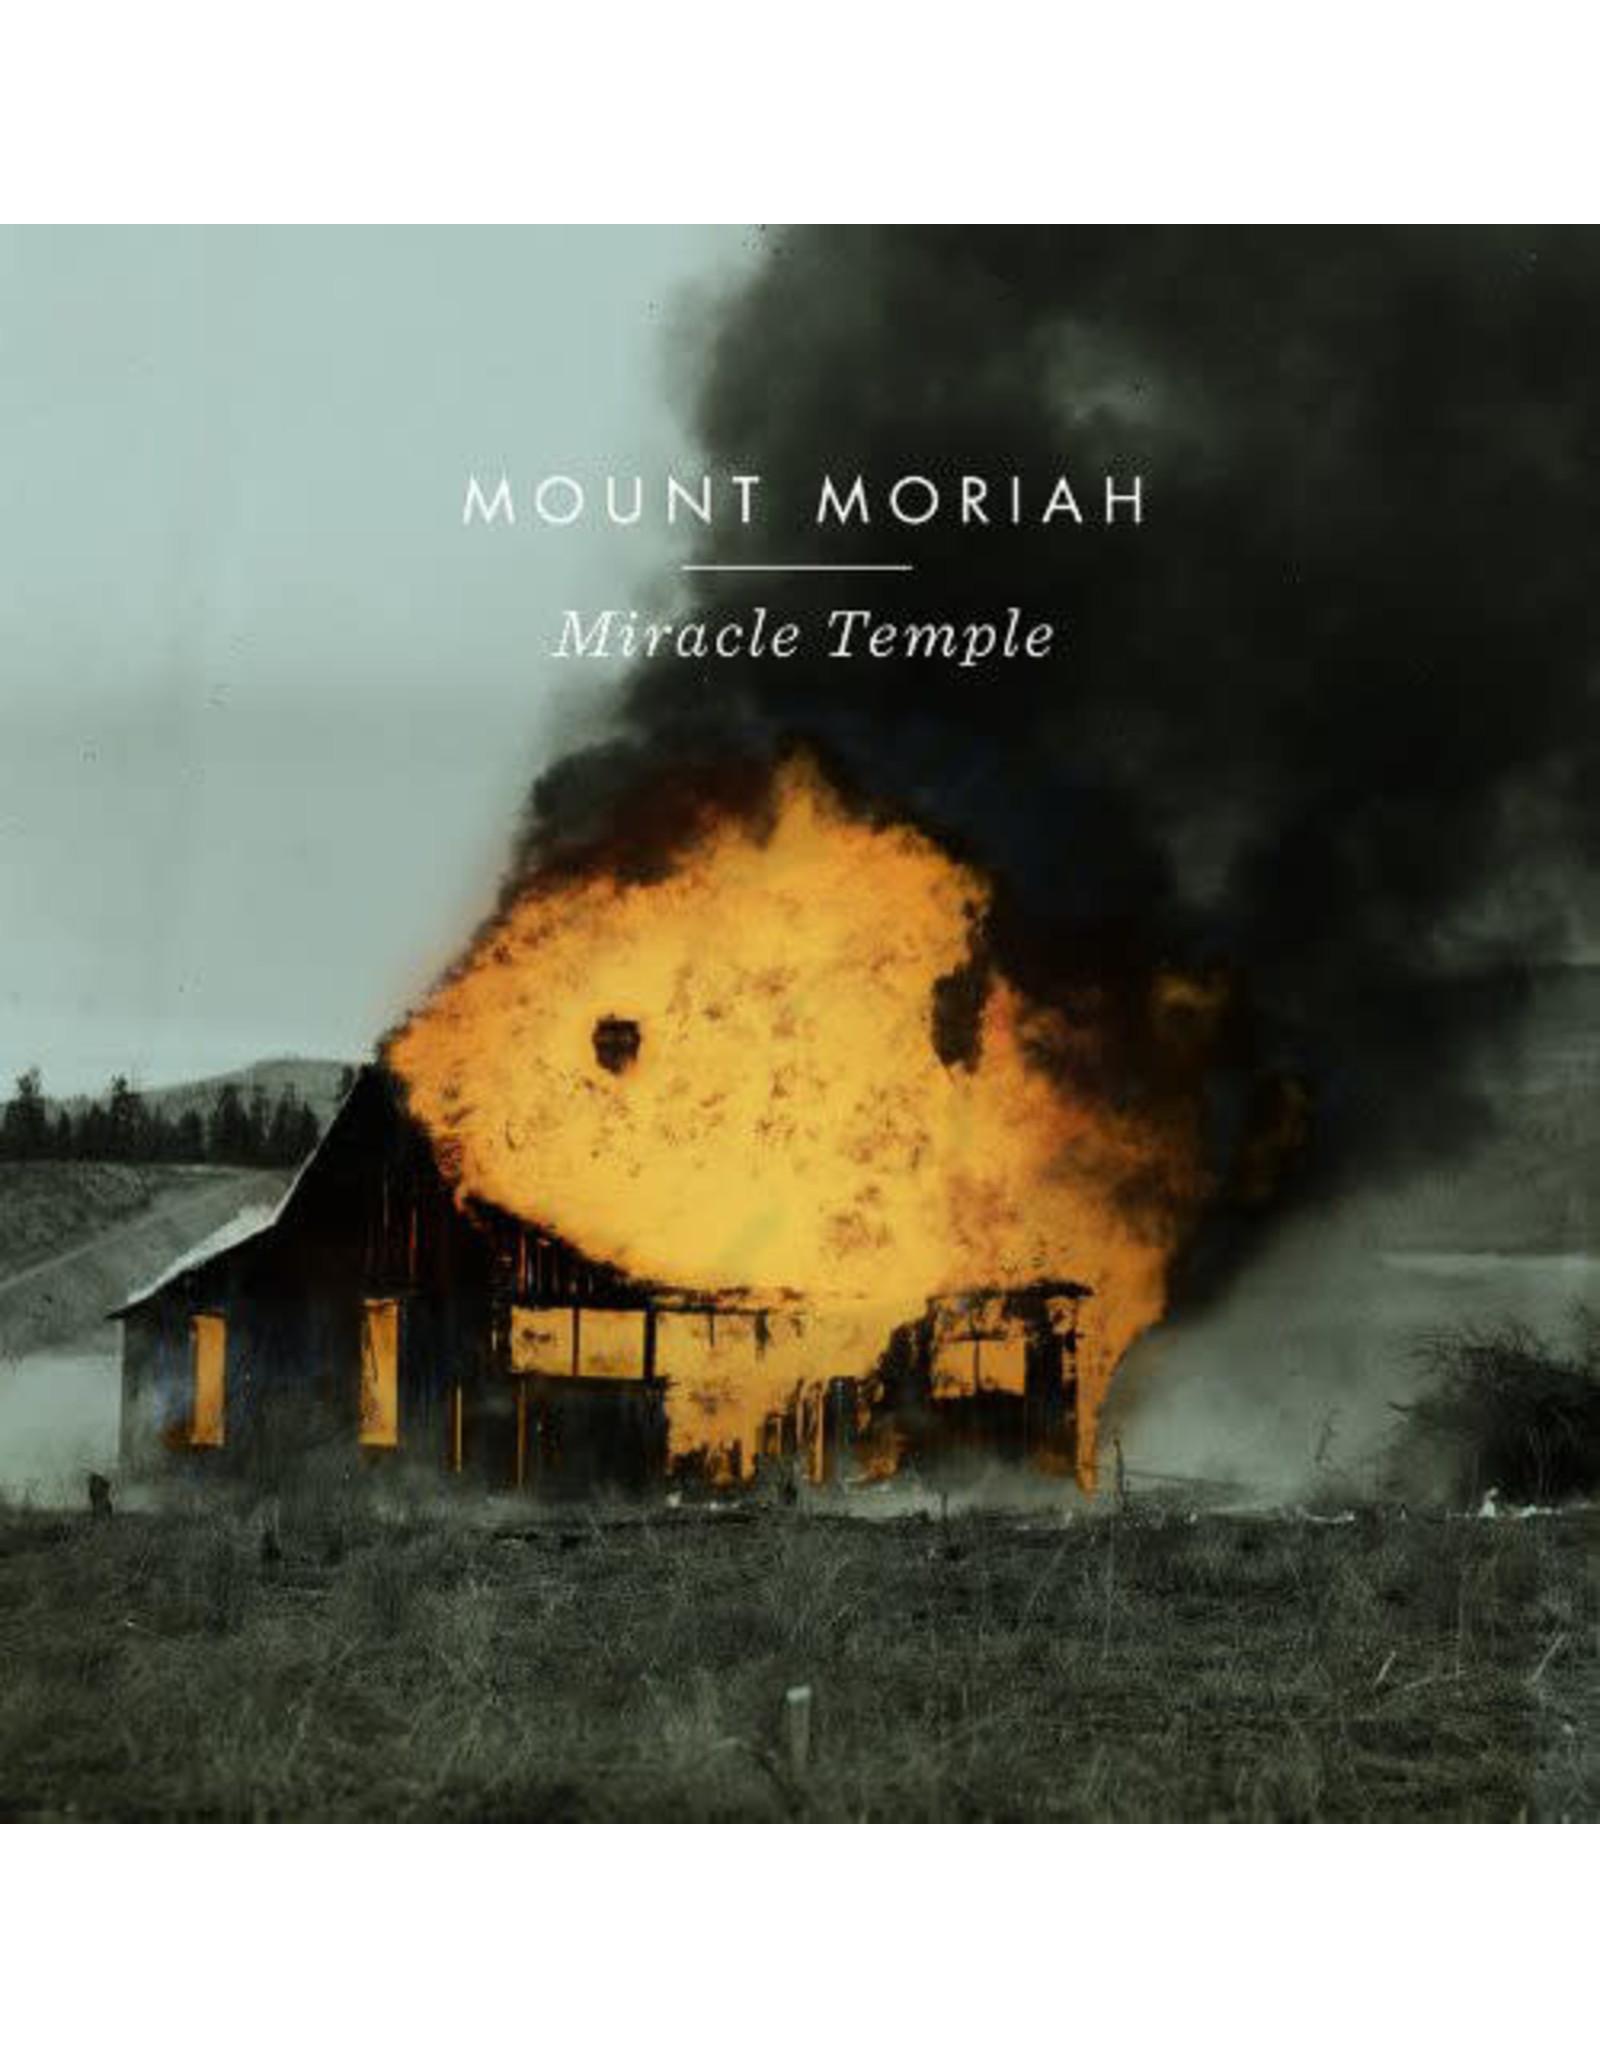 Miracle Temple - Mount Moriah CD